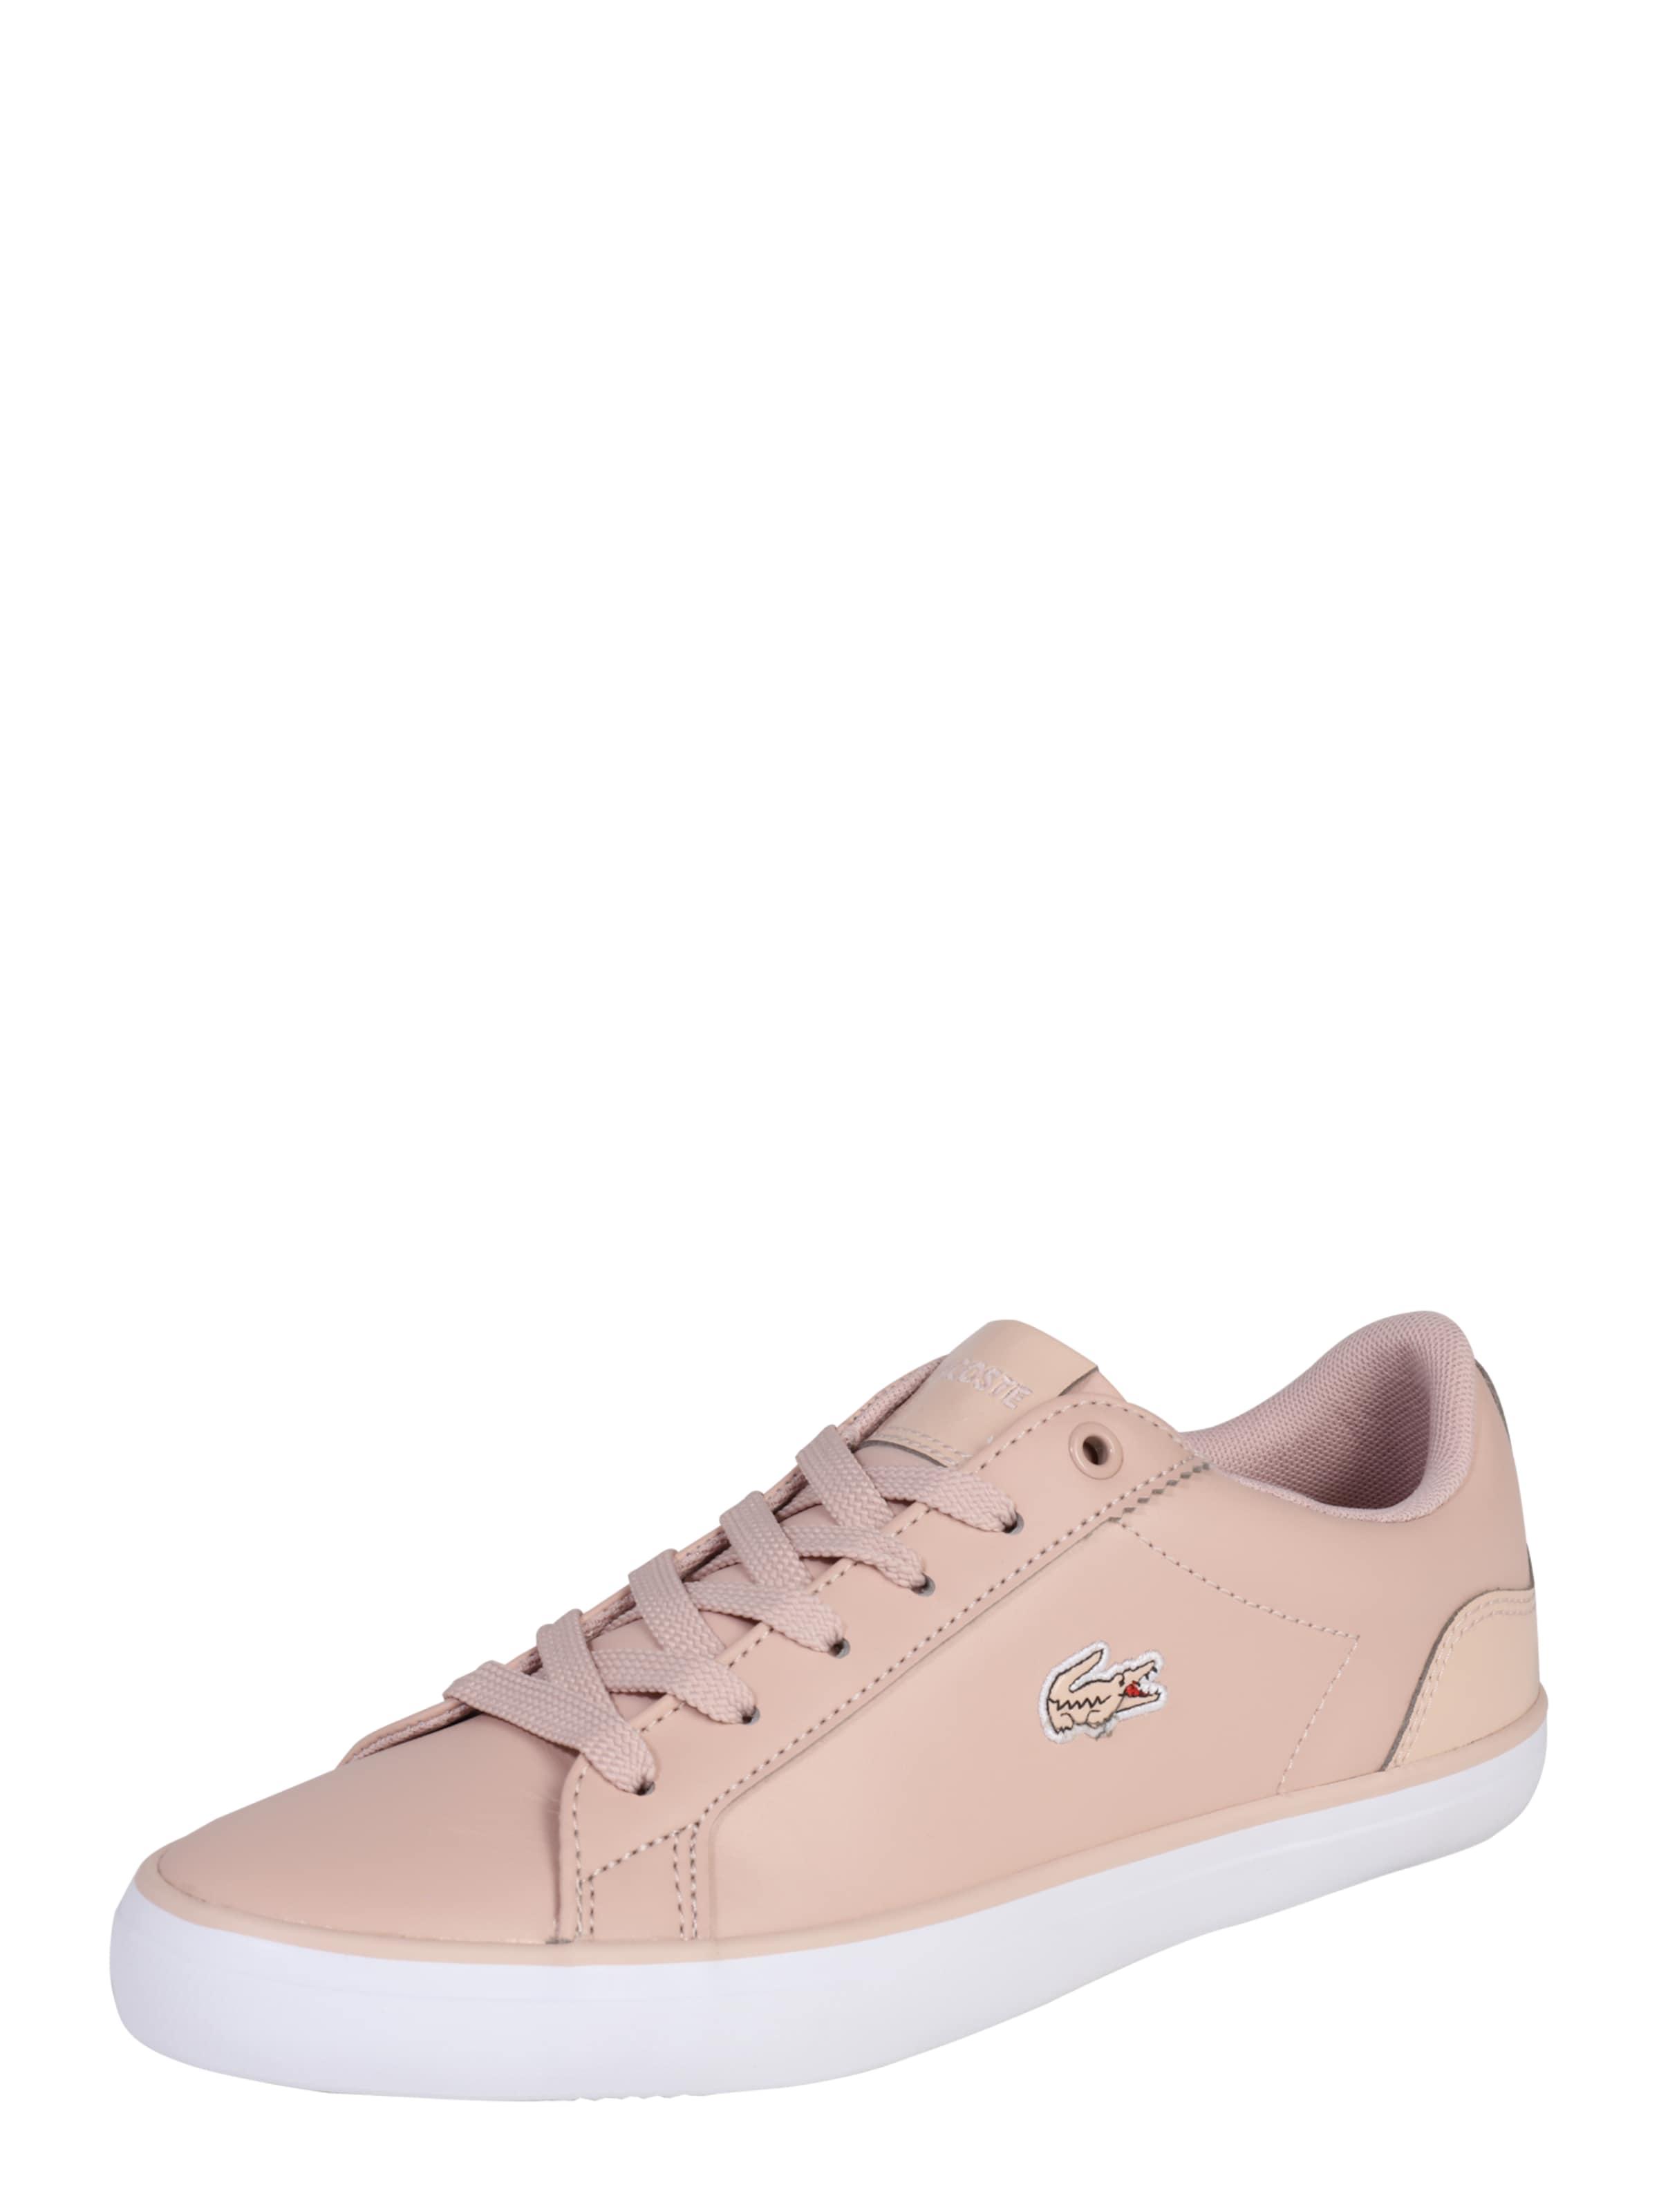 LACOSTE LACOSTE LACOSTE Sneaker LEROND Verschleißfeste billige Schuhe ca8629